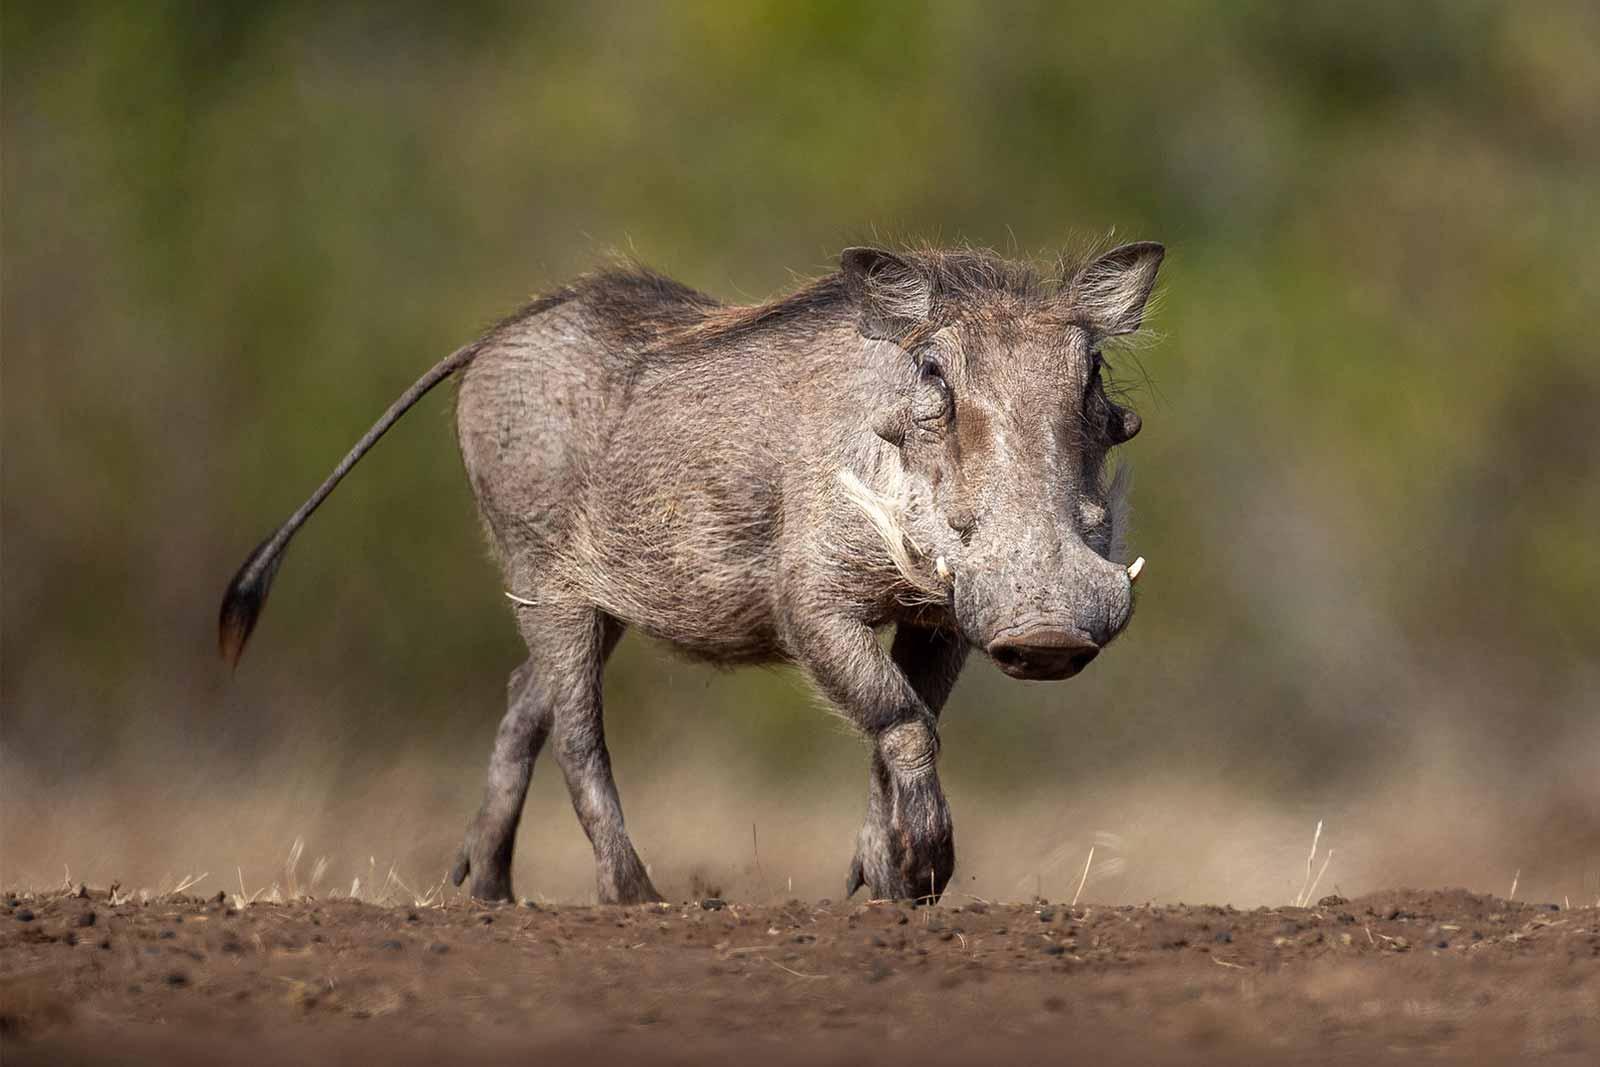 African pig or swing, the warthog (Phacochoerus africanus)